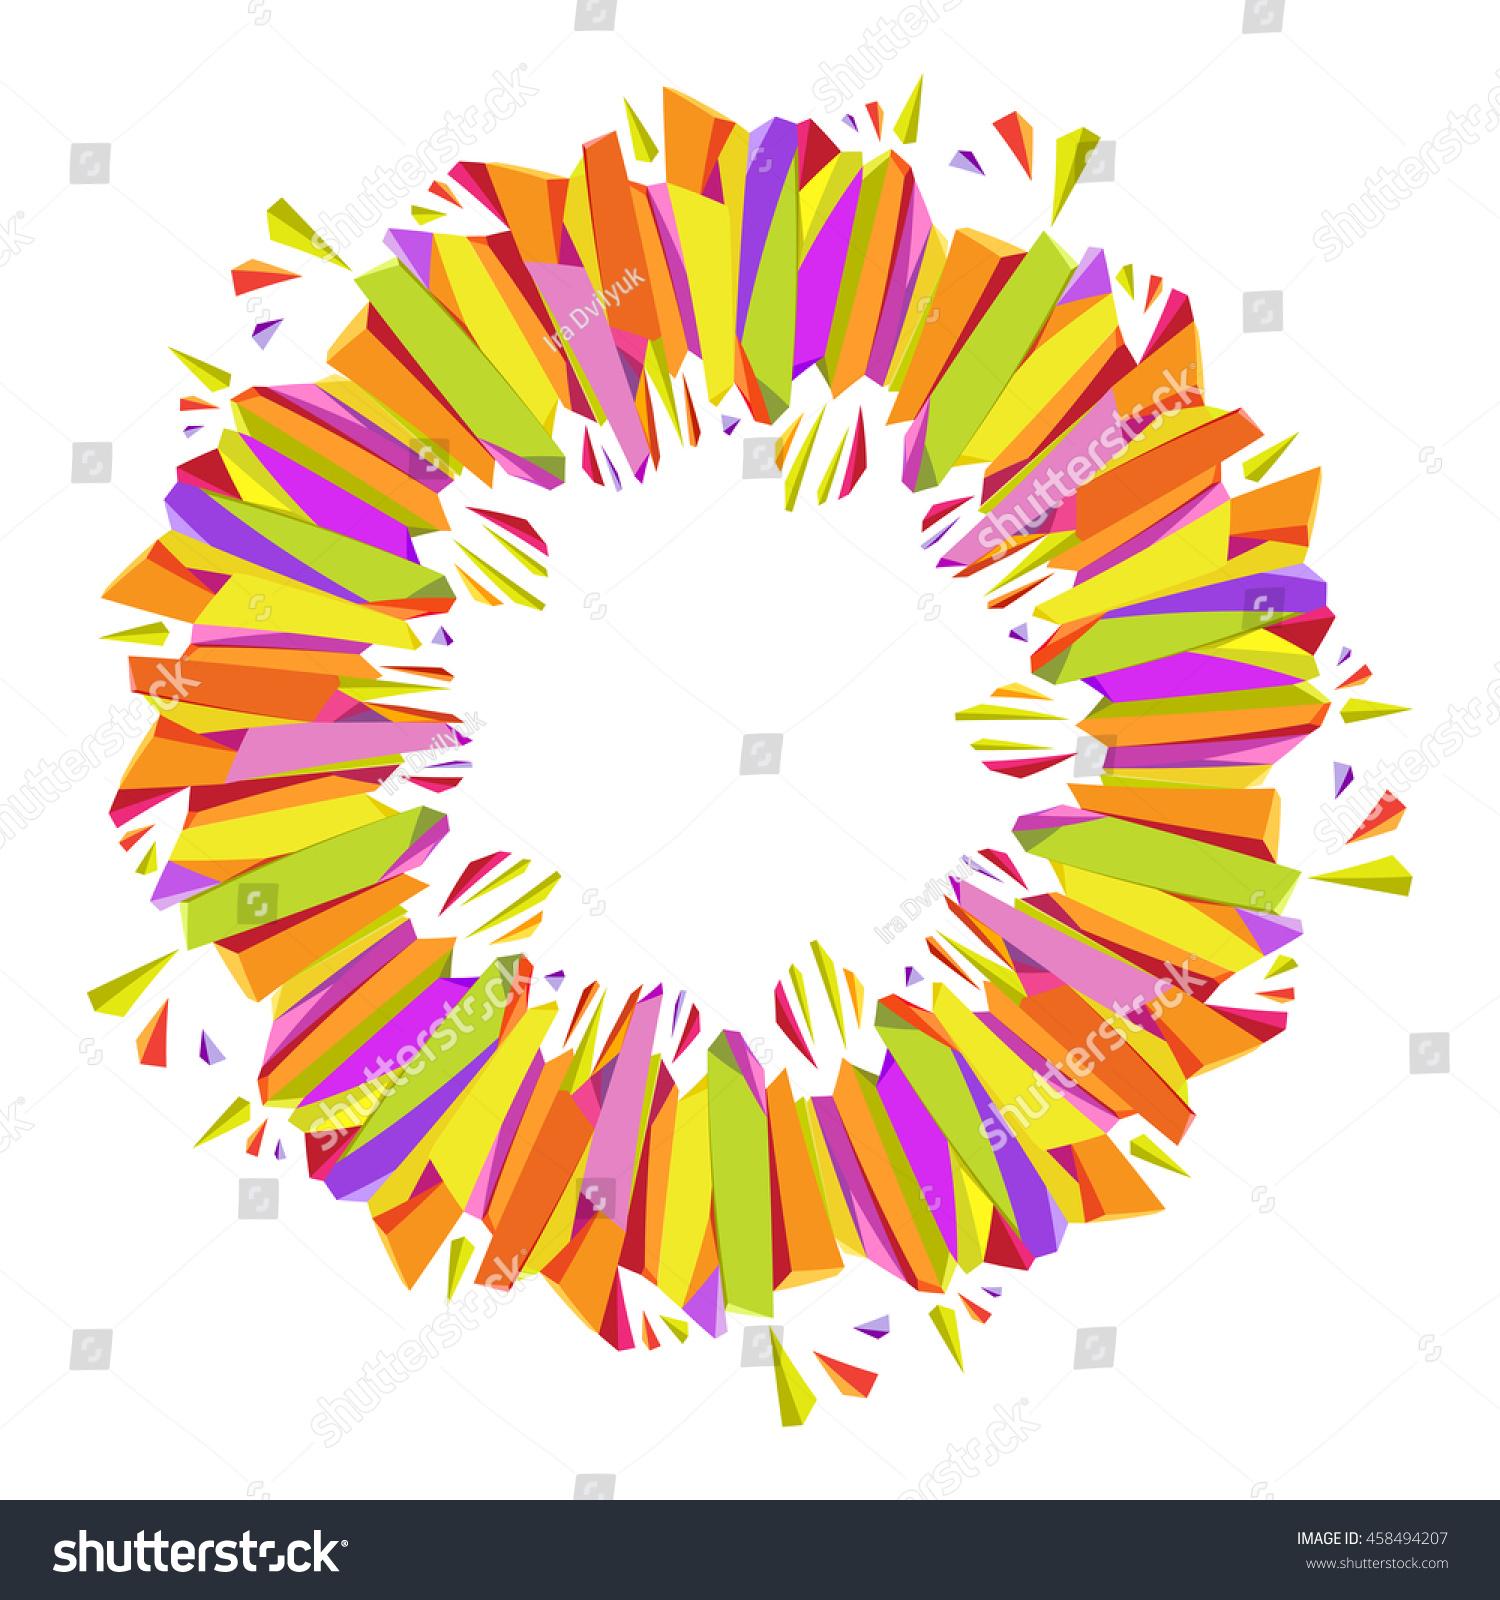 geometric yellow background illustration - photo #34